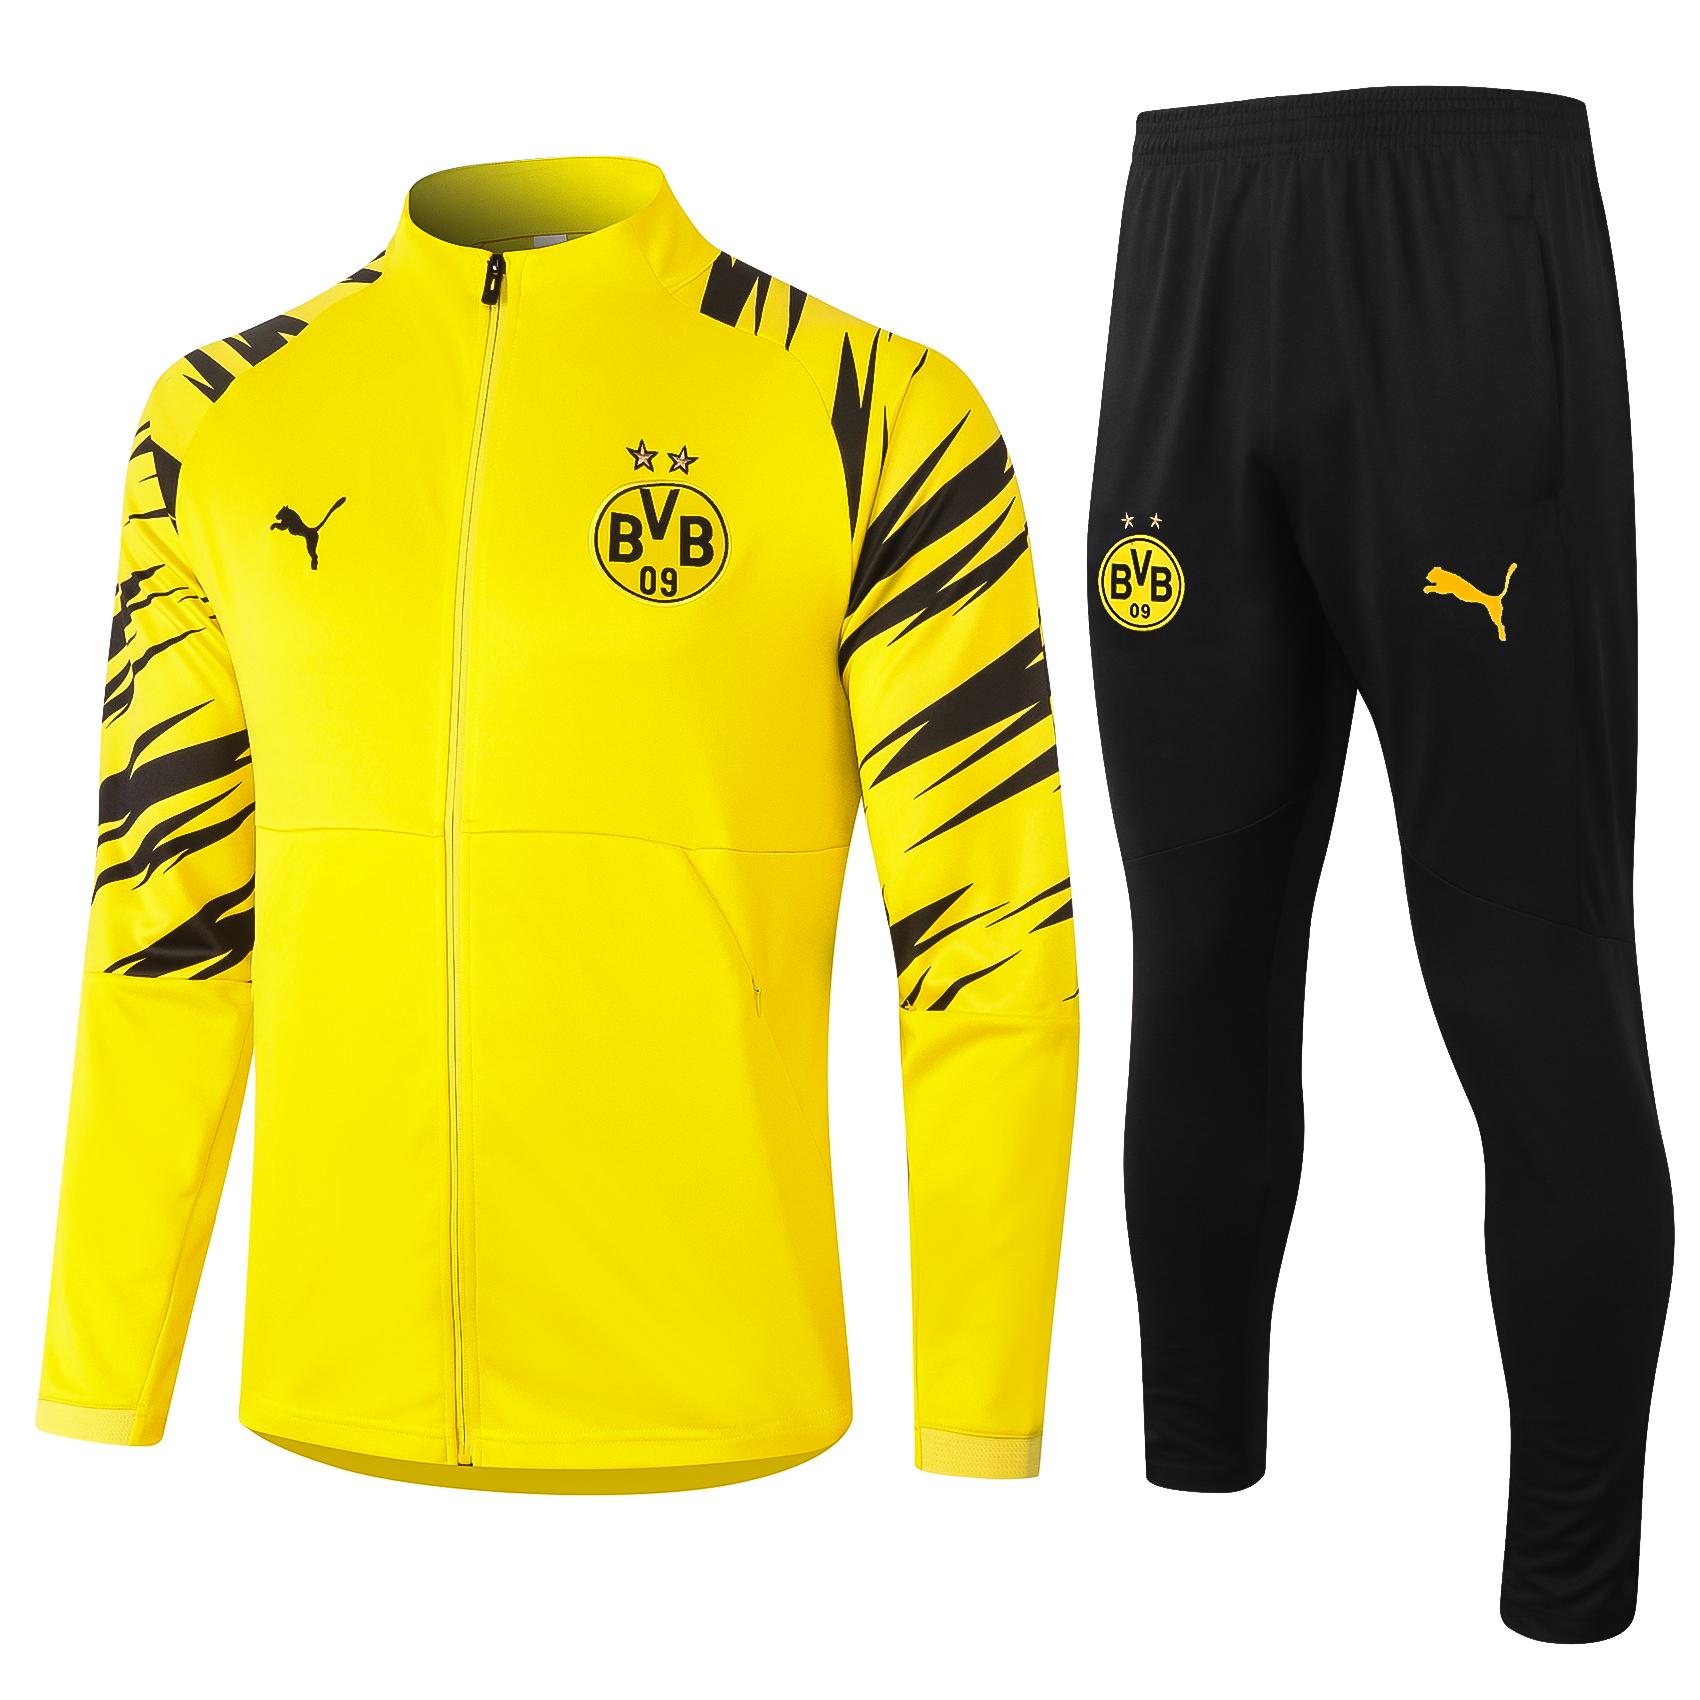 Survêtement Training BVB Dortmund saison 2020/2021